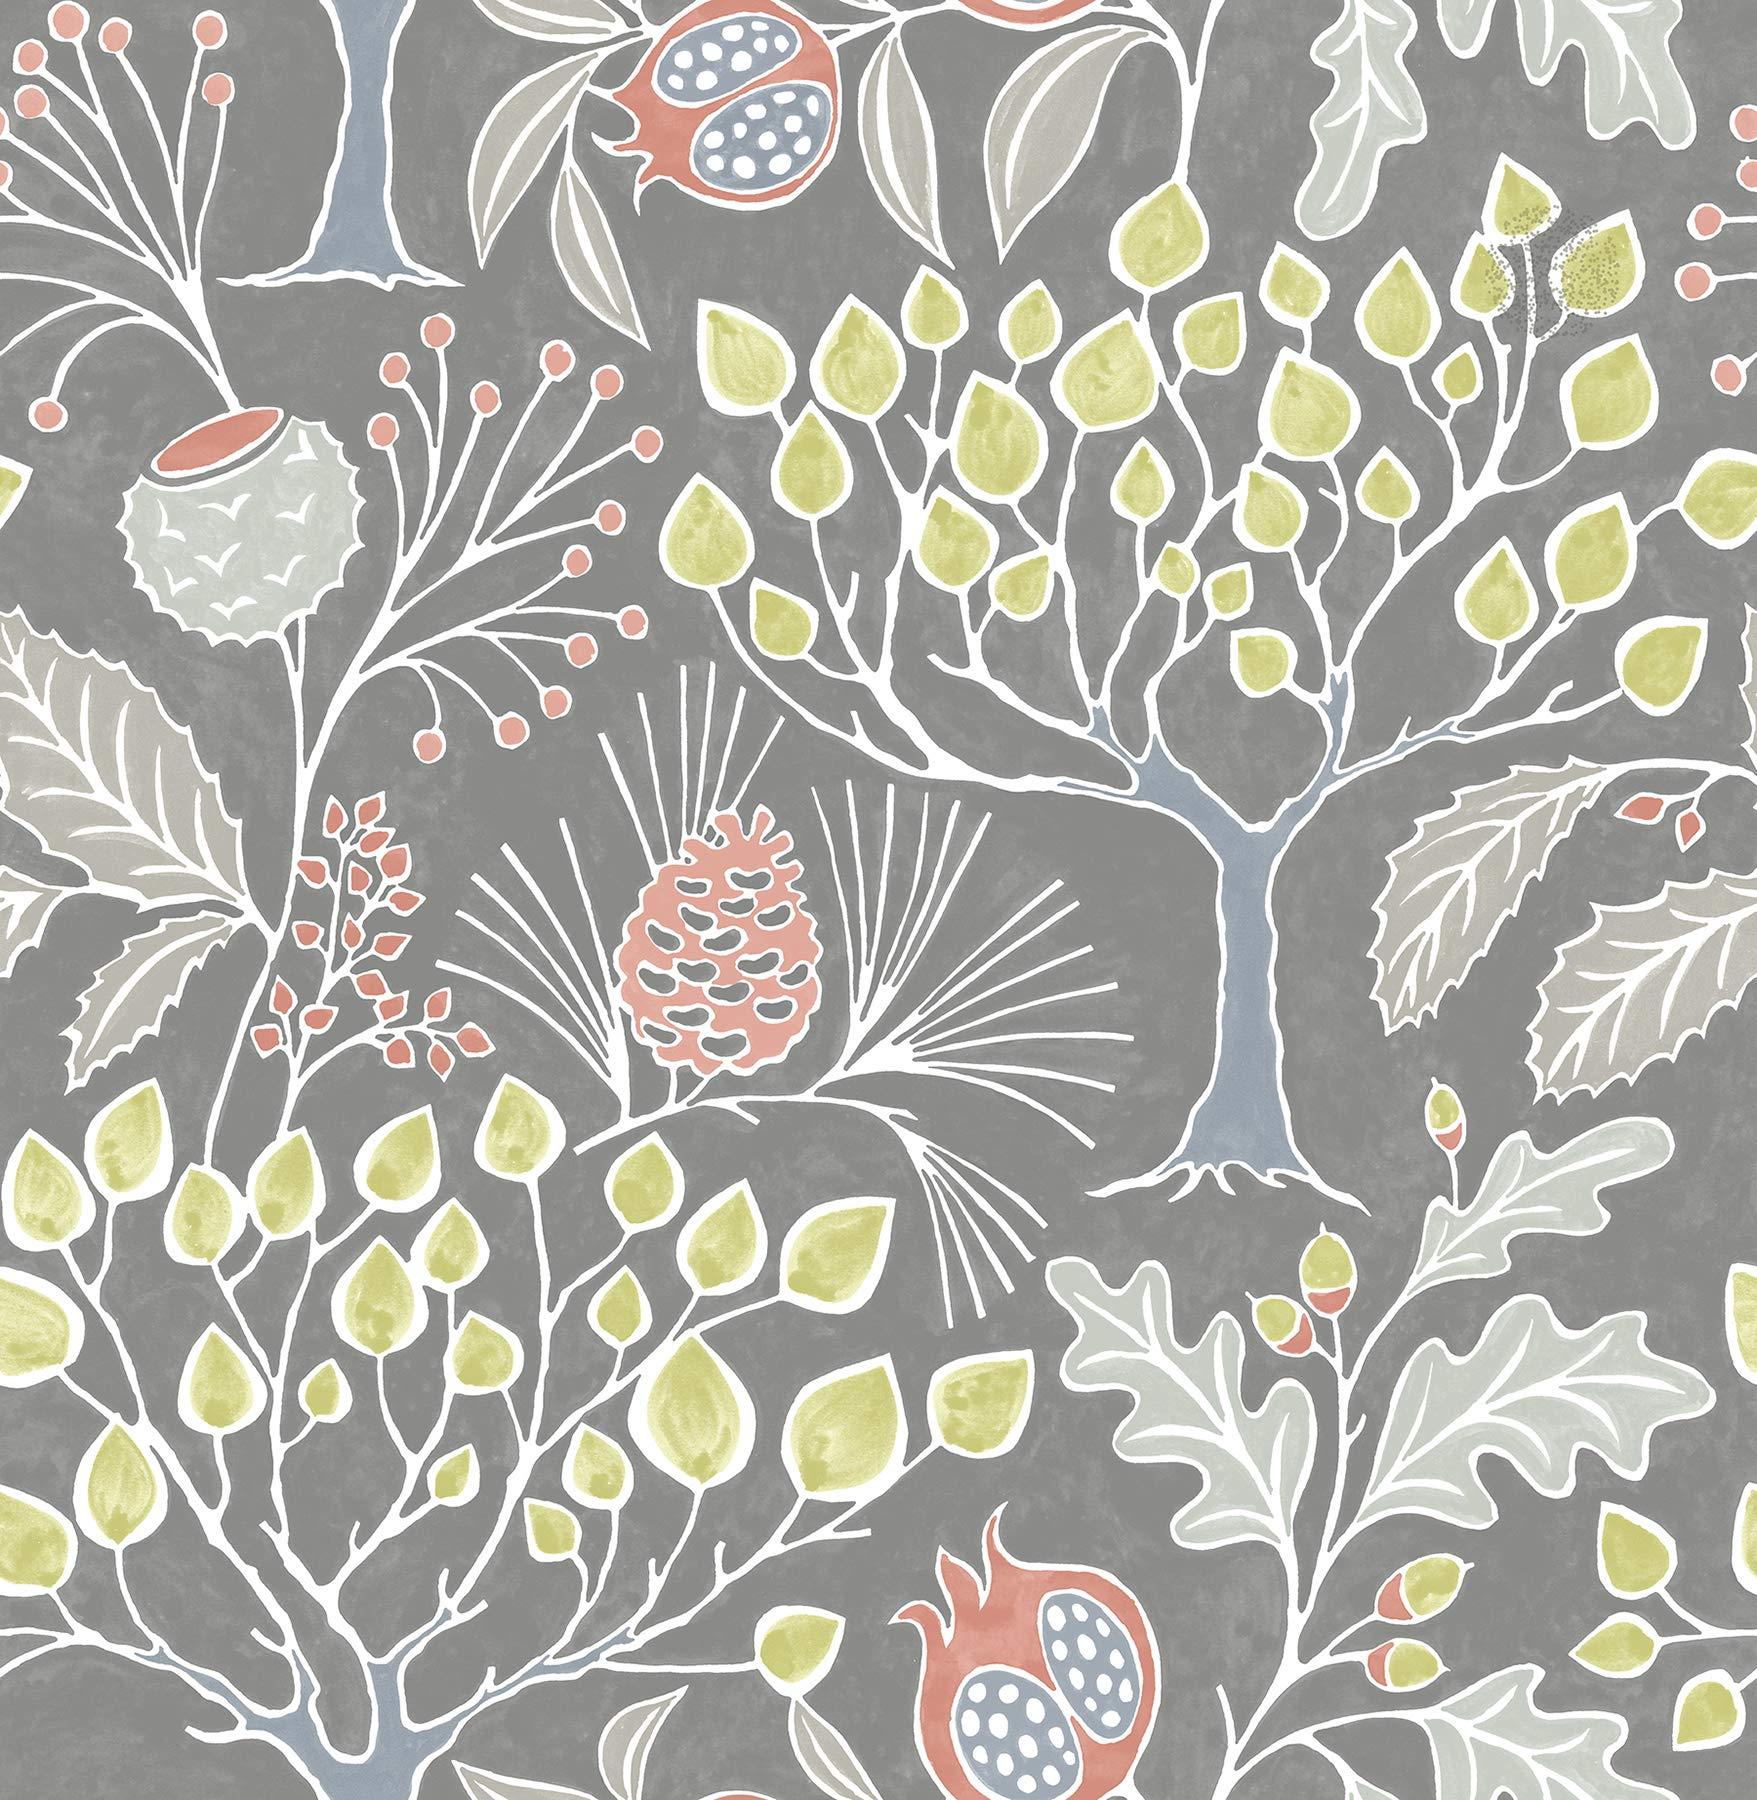 NuWallpaper NU3039 Groovy Garden Grey Peel & Stick Multicolor Wallpaper by NuWallpaper